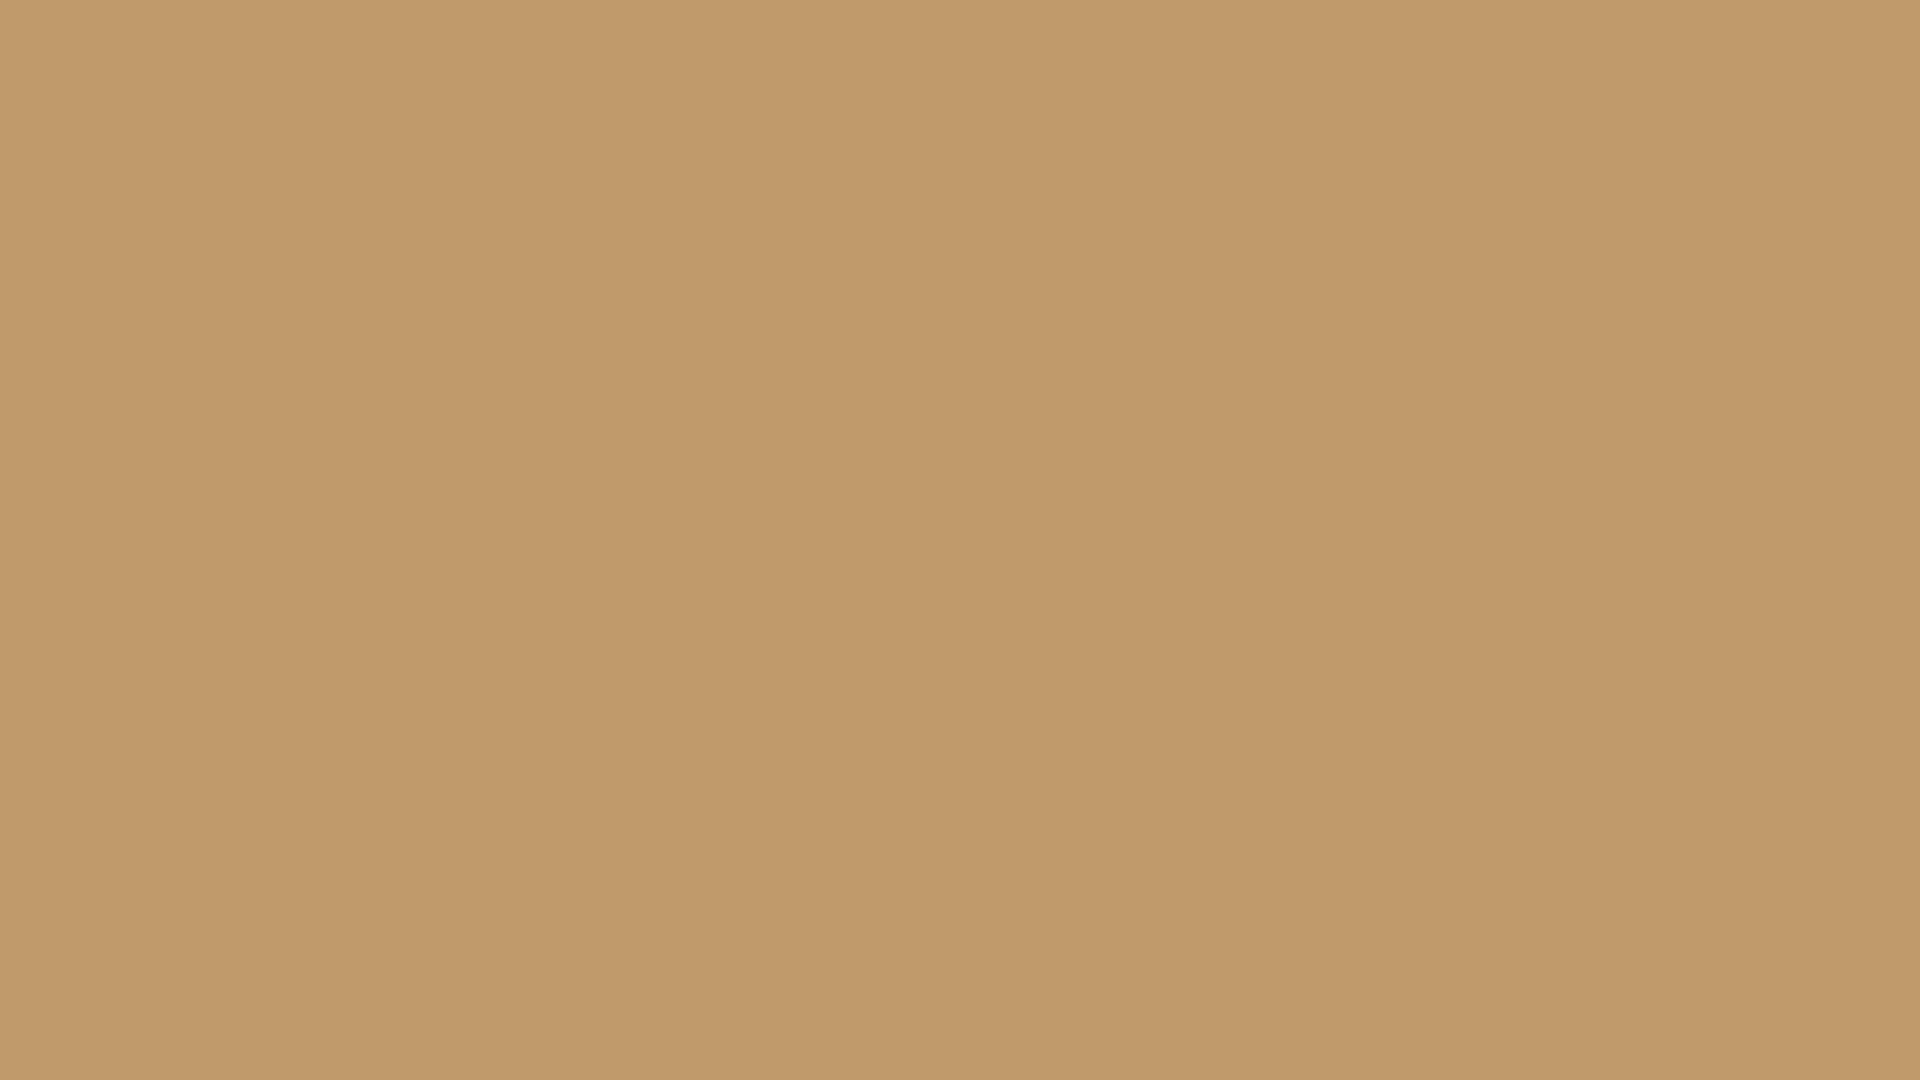 3d White Wallpaper Hd 1920x1080 Desert Solid Color Background